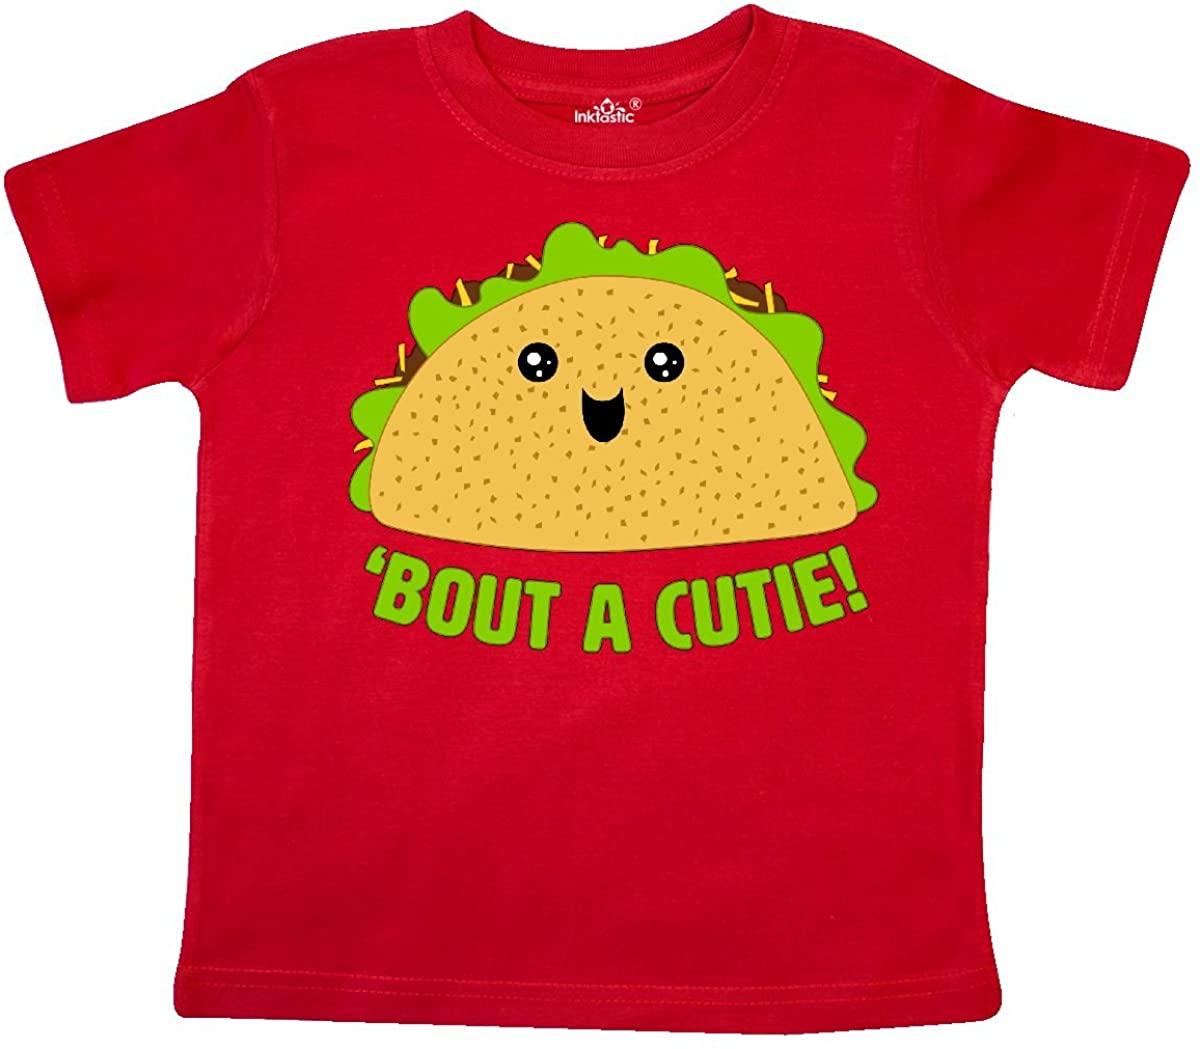 inktastic Taco Bout a Cutie Cute Taco Pun Toddler T-Shirt